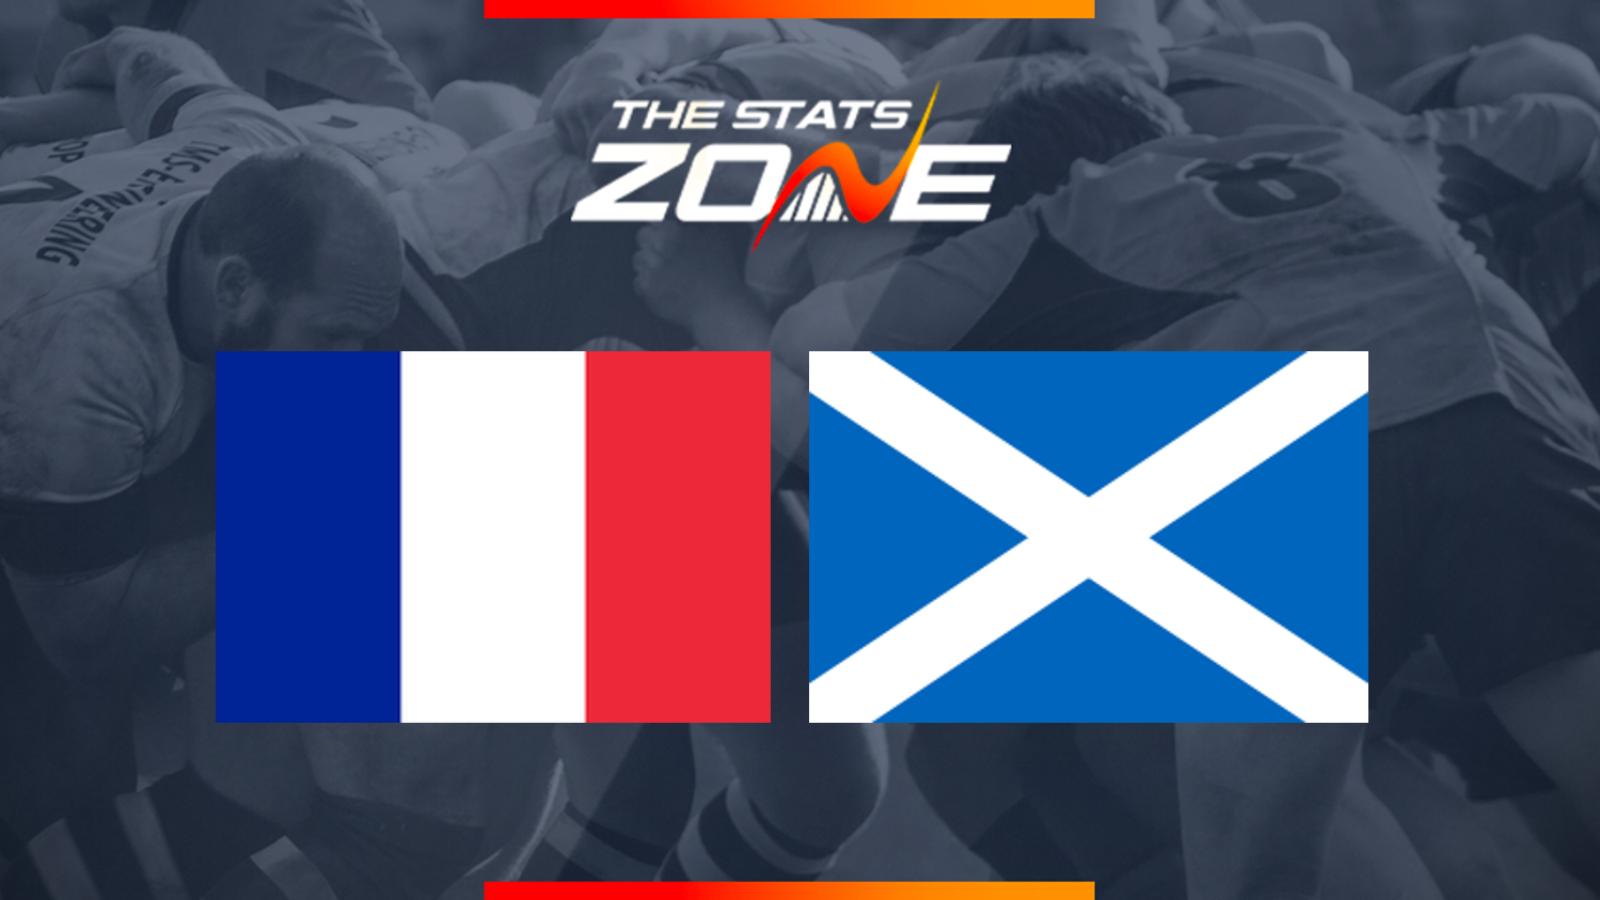 scotland v france - photo #4